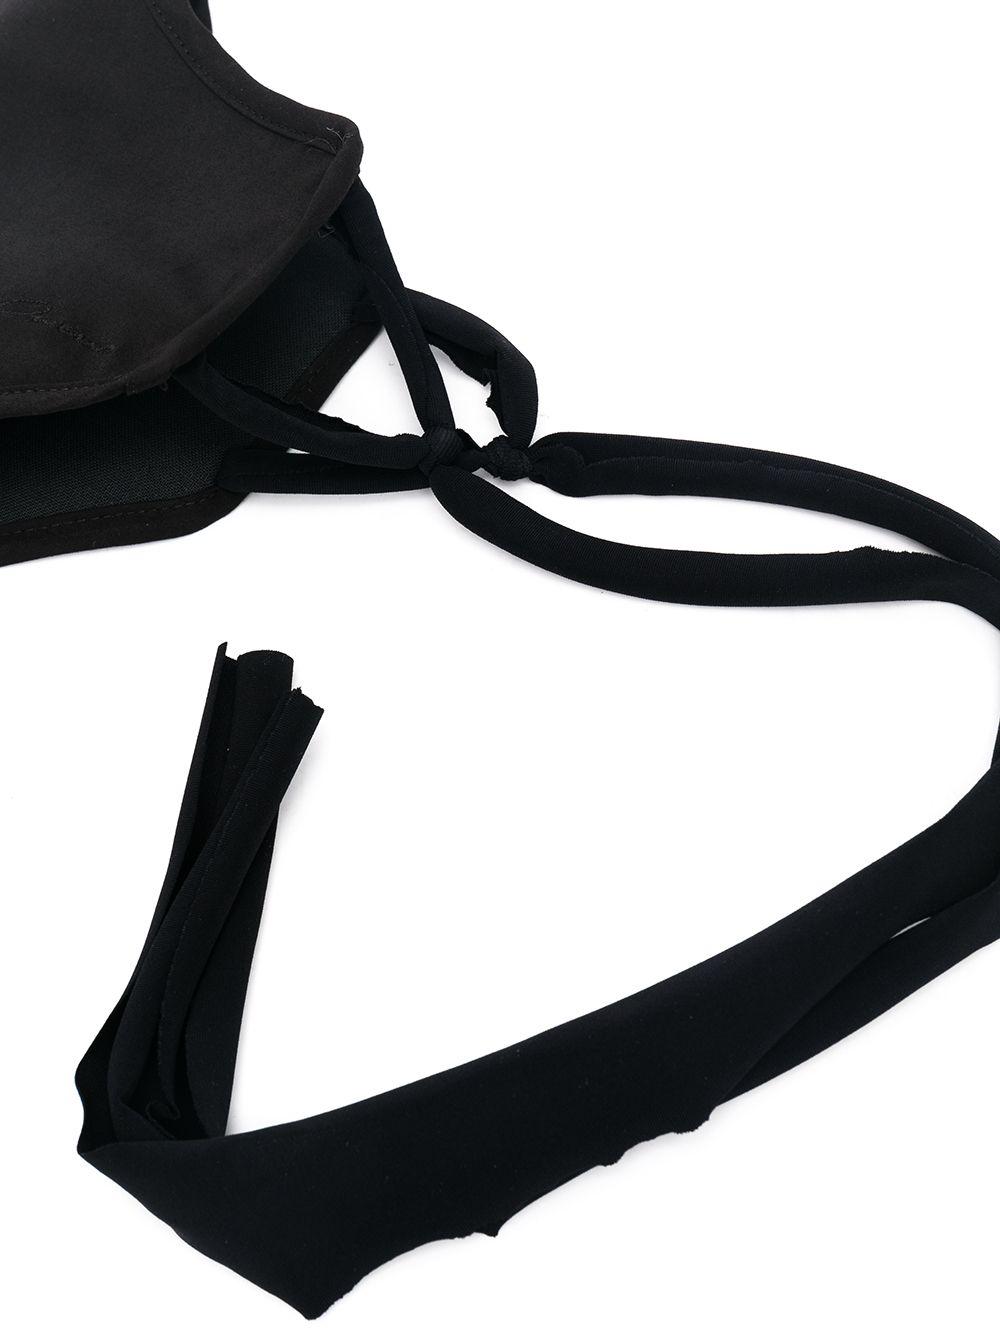 mascherina con logo uomo nera in cotone RICK OWENS   Mascherine   RR02A5452 P09